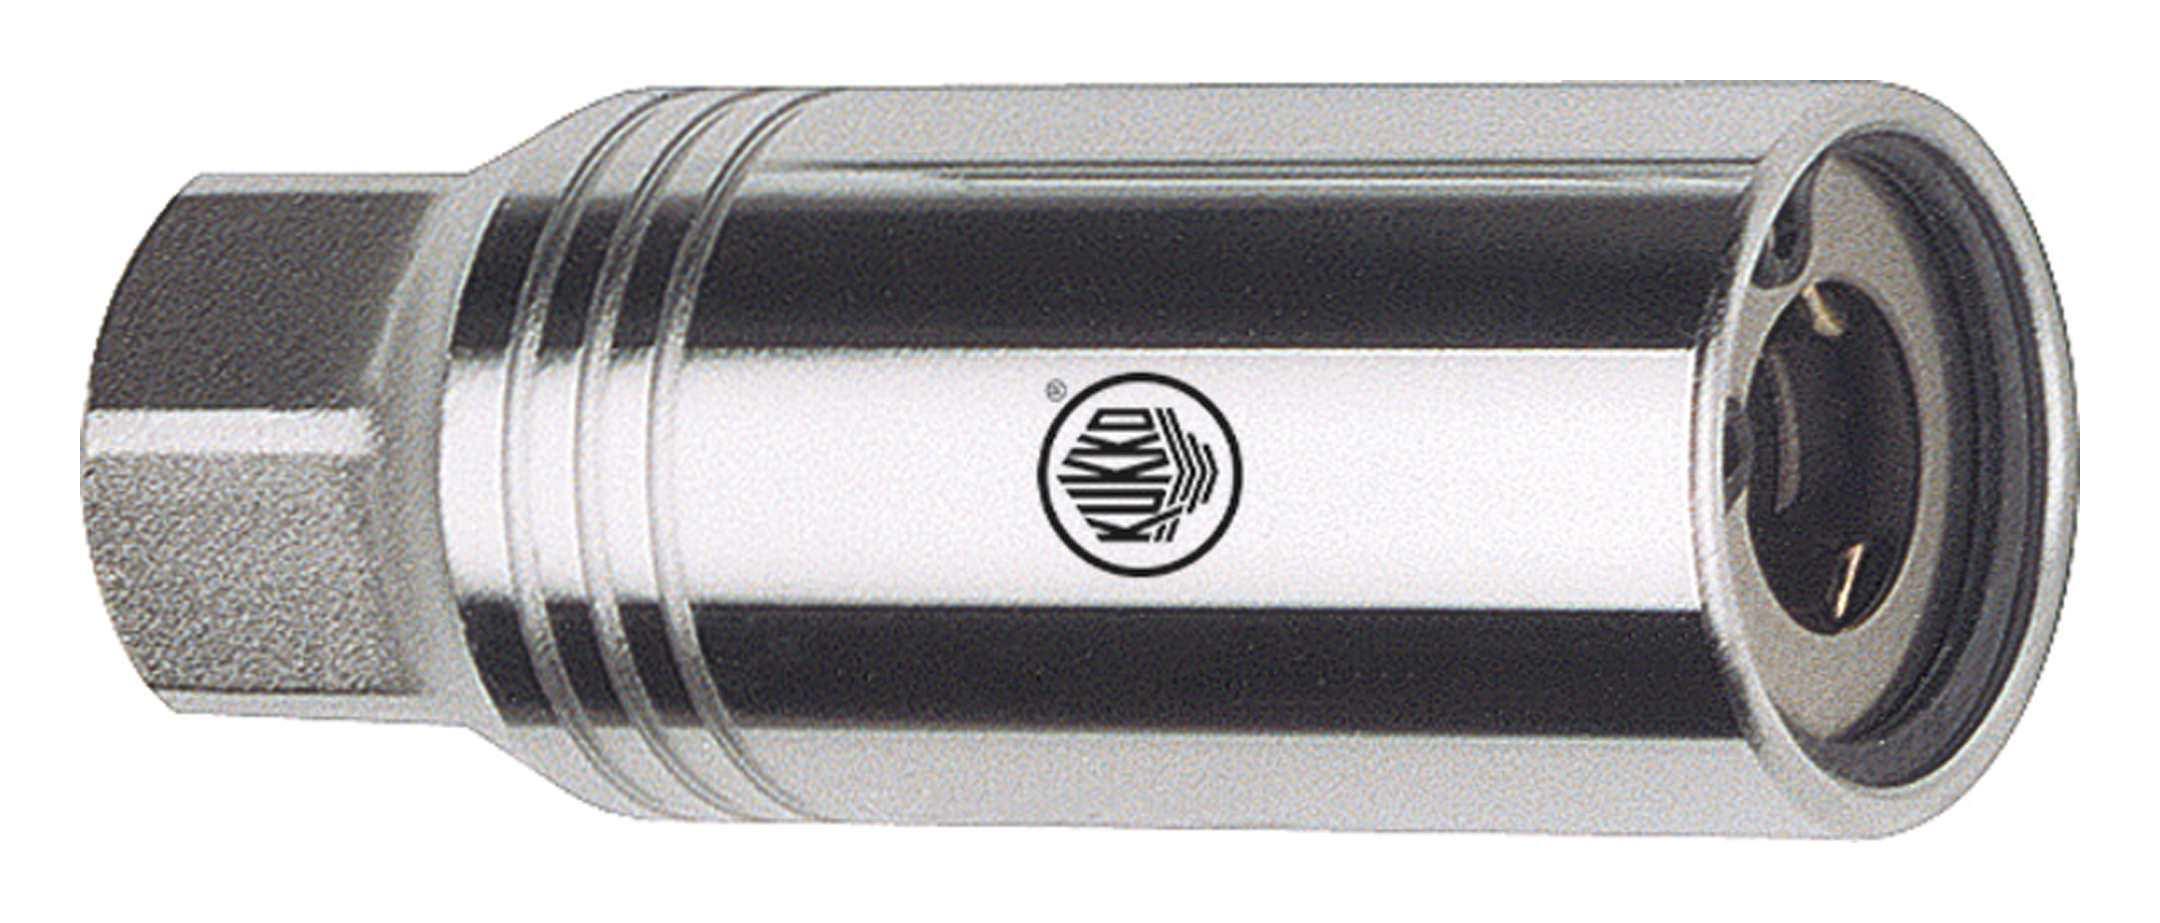 Stehbolzen-Ausdreher 6mm - 53- 6